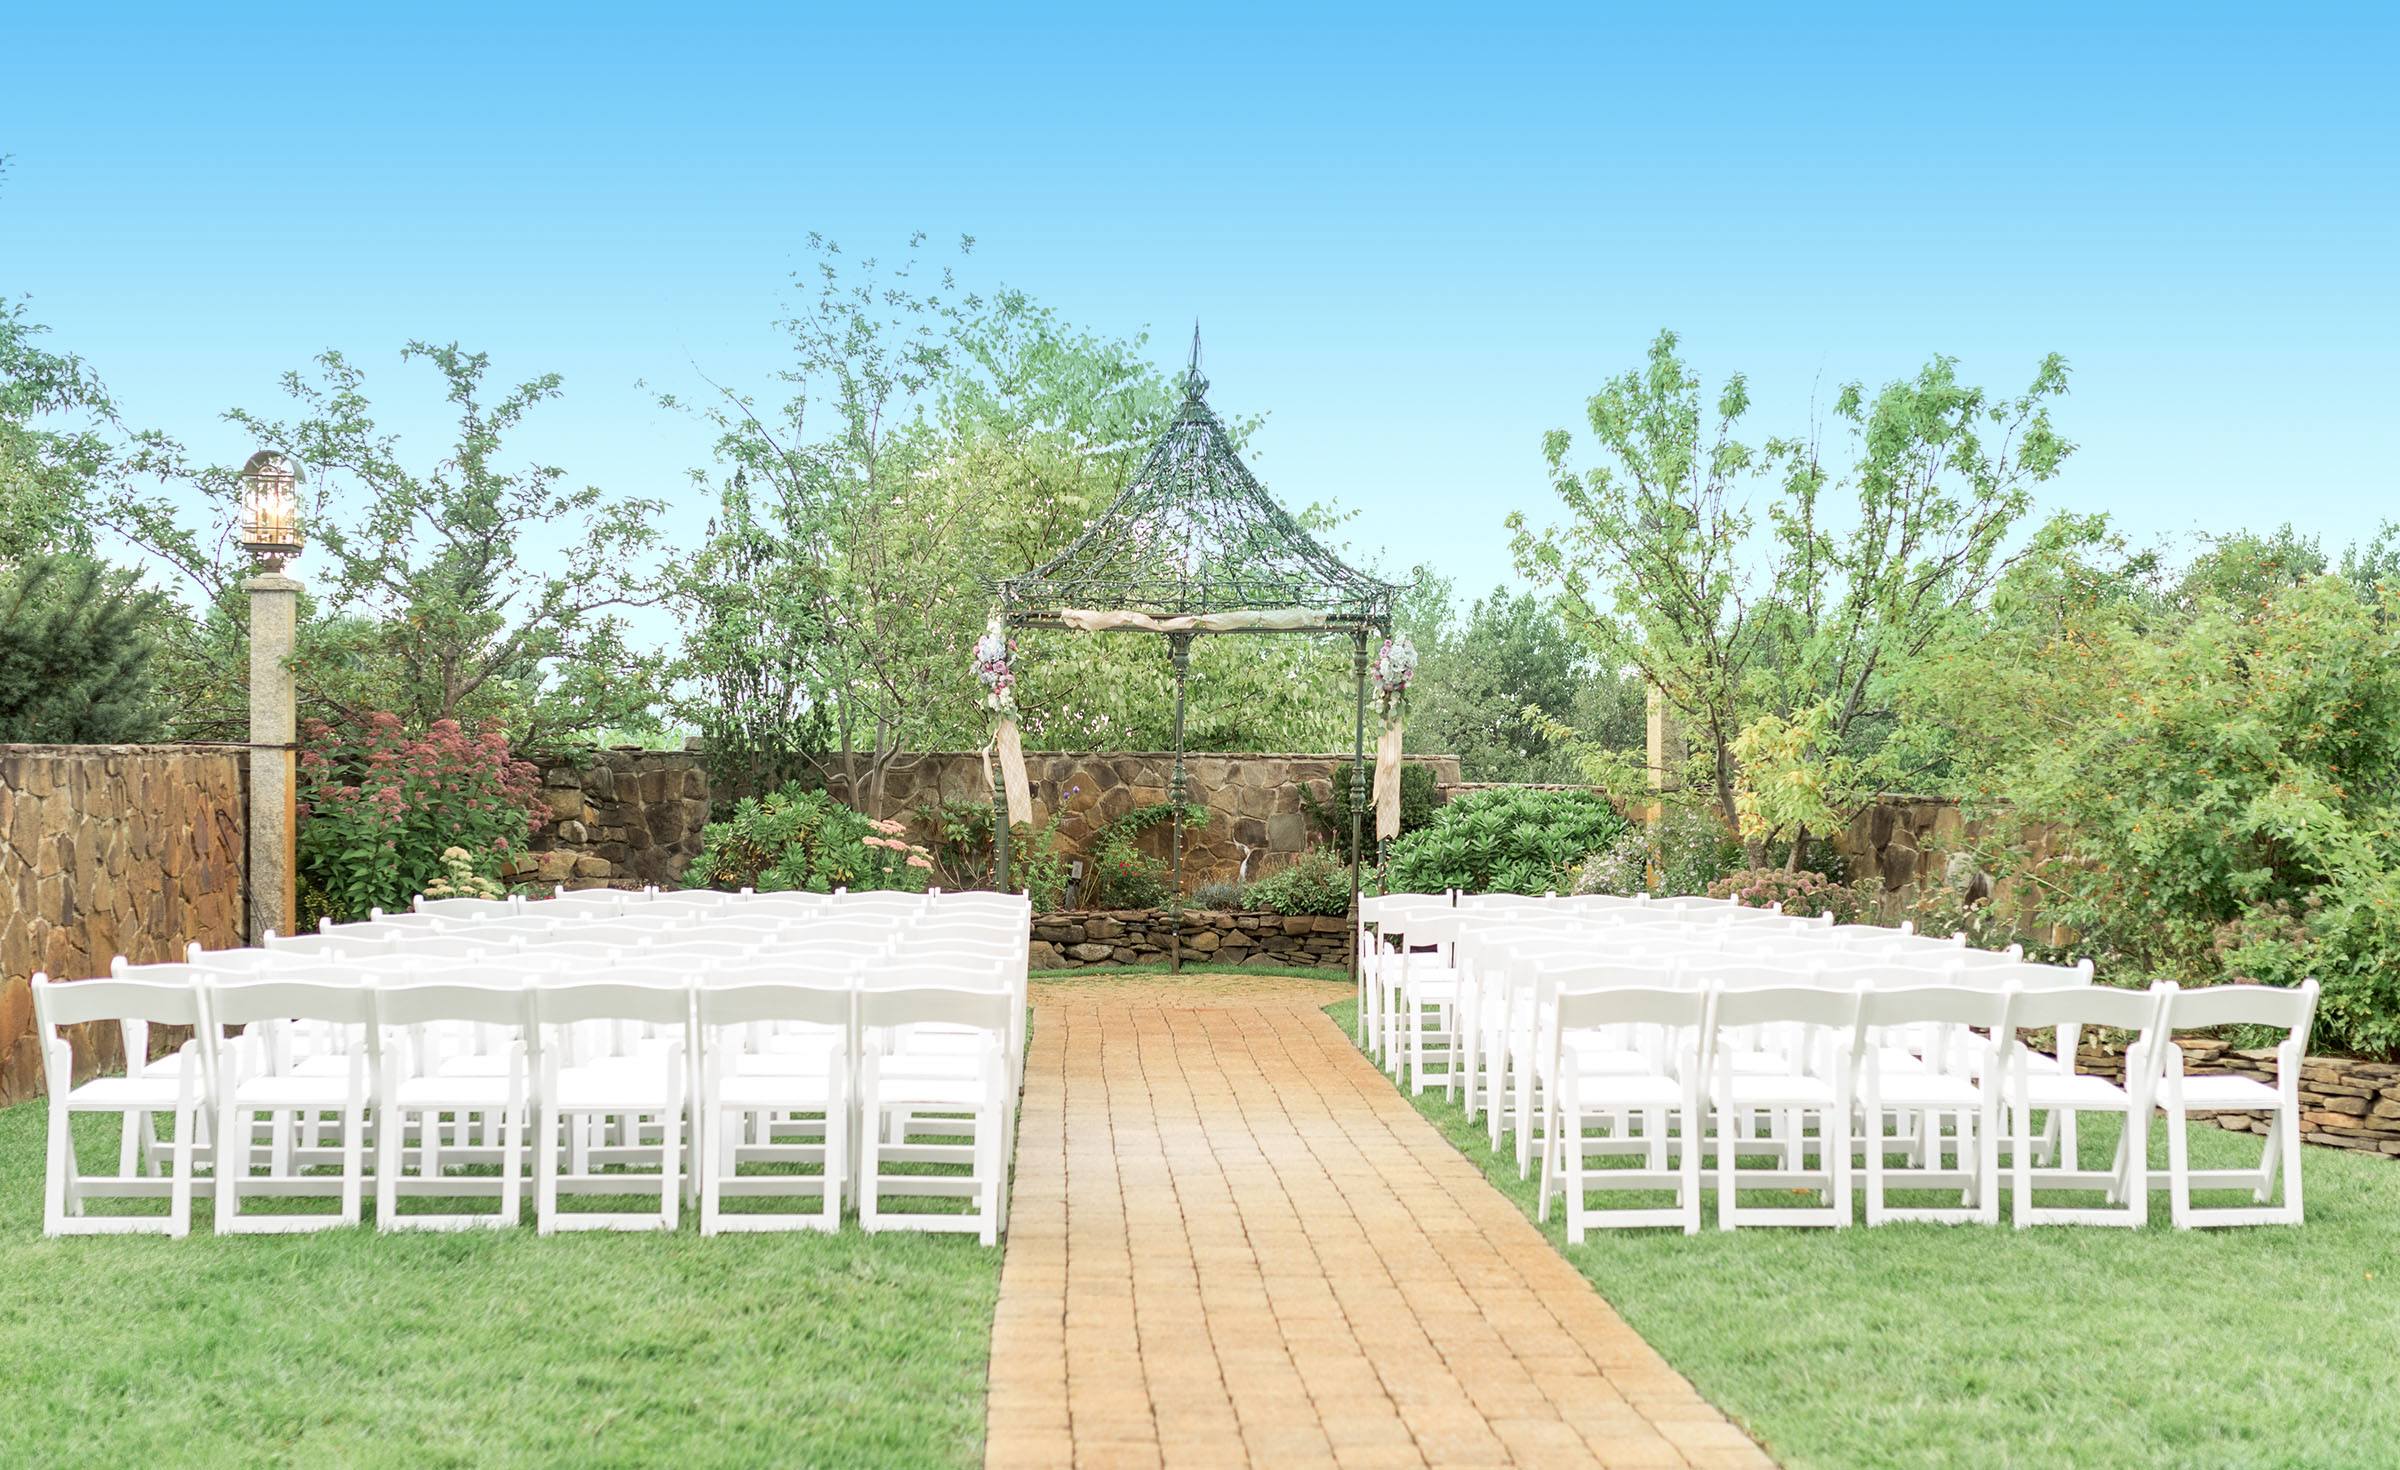 Outdoor Ceremony - Granite Rose- Hampstead, New Hampshire - Rockingham County - Wedgewood Weddings